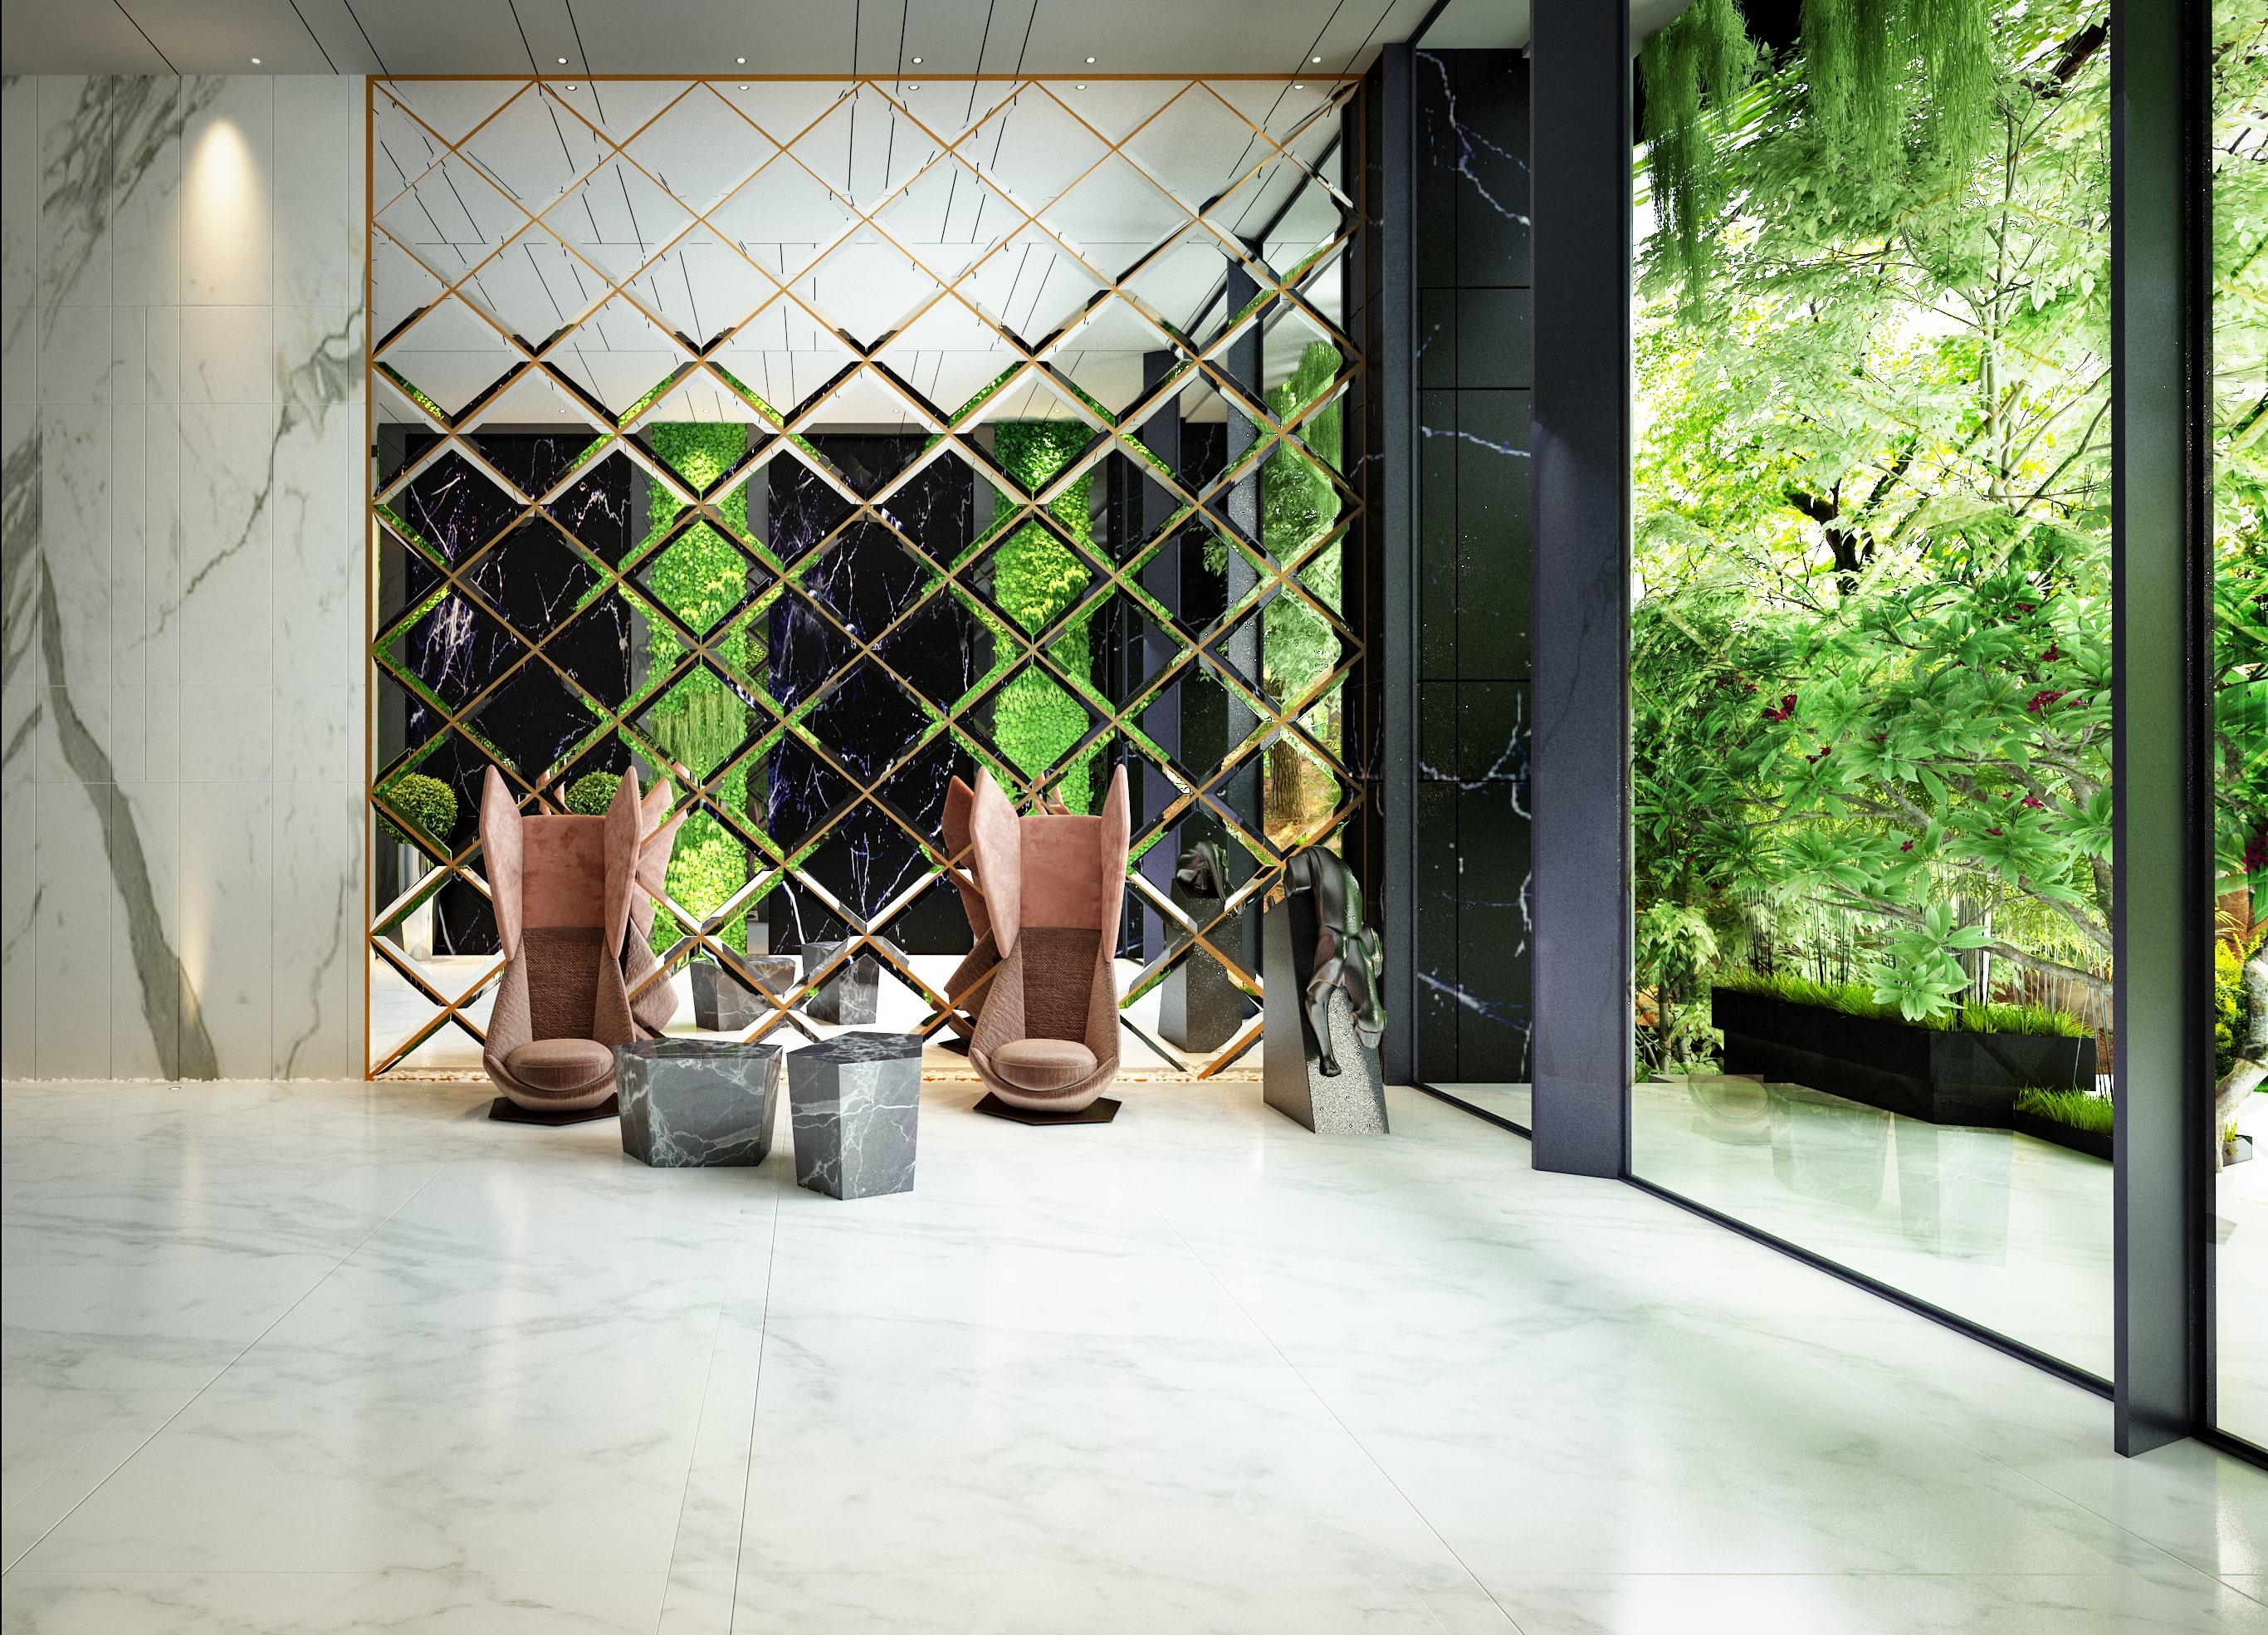 https://ahe-ro.s3.amazonaws.com/8109/penthouse-si-apartamente-unirii-%283%29.jpg